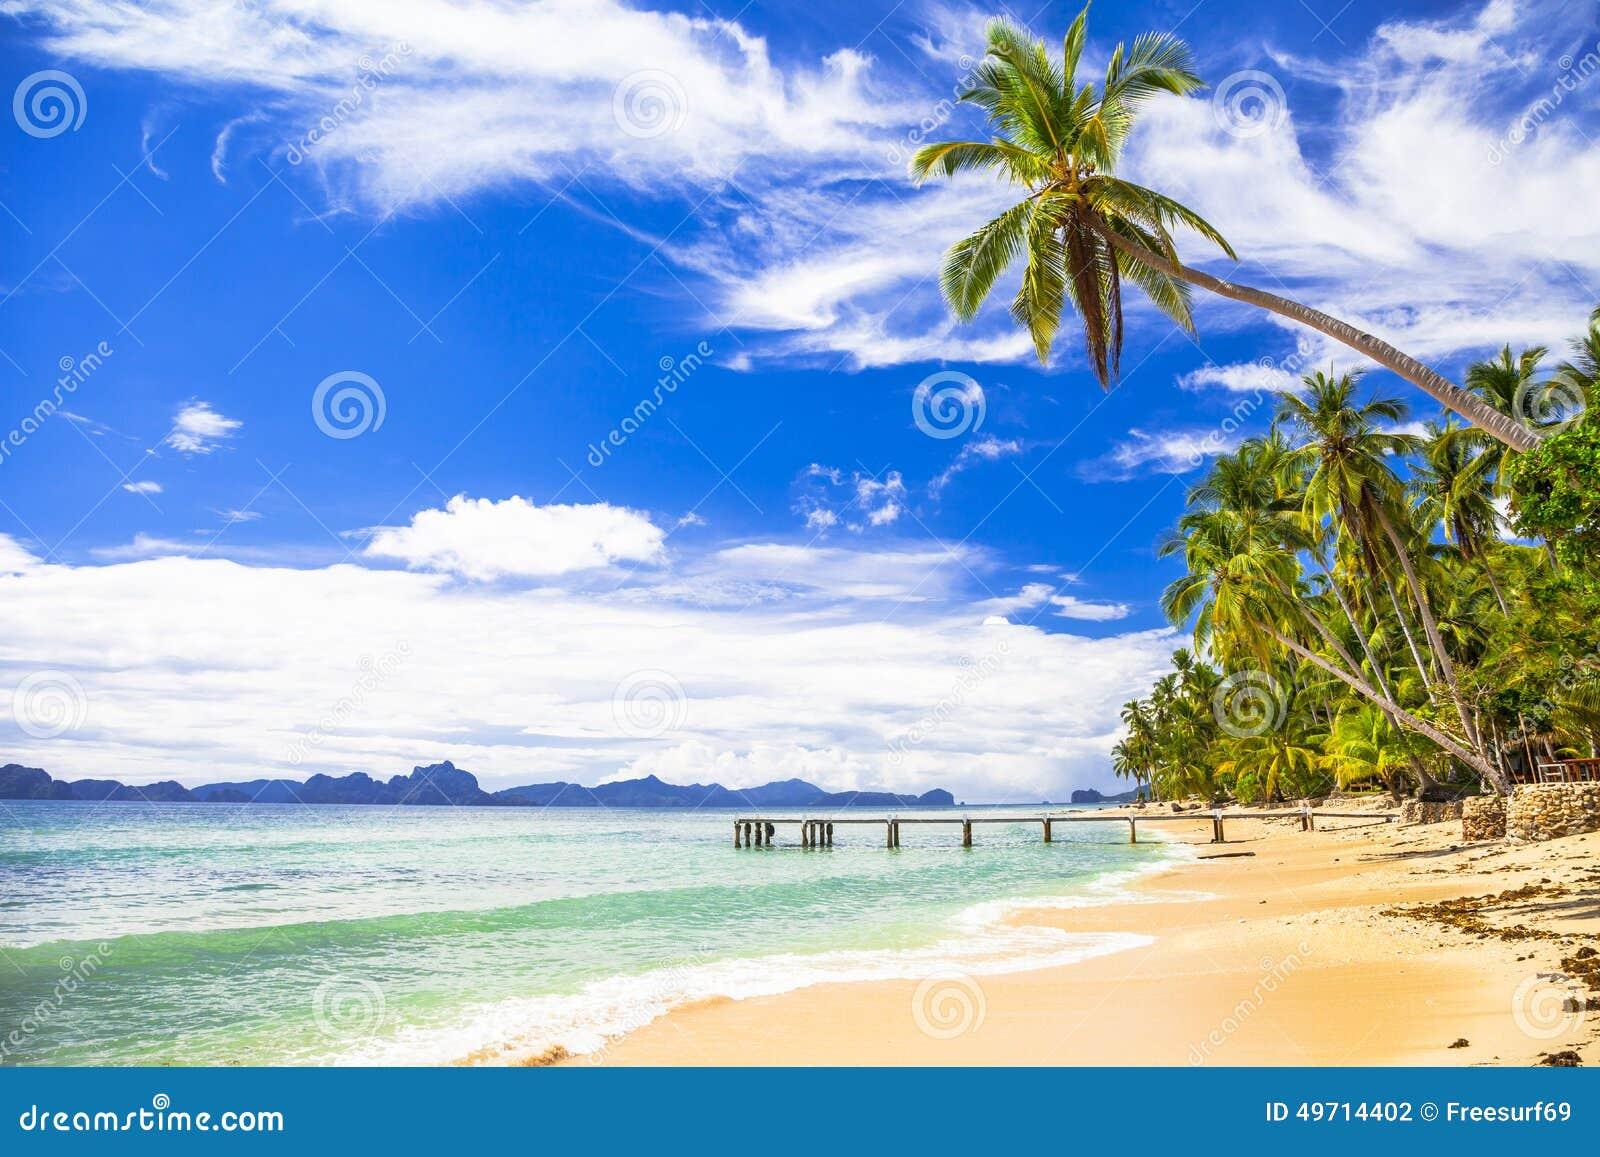 the beautiful seaside scenery - photo #15